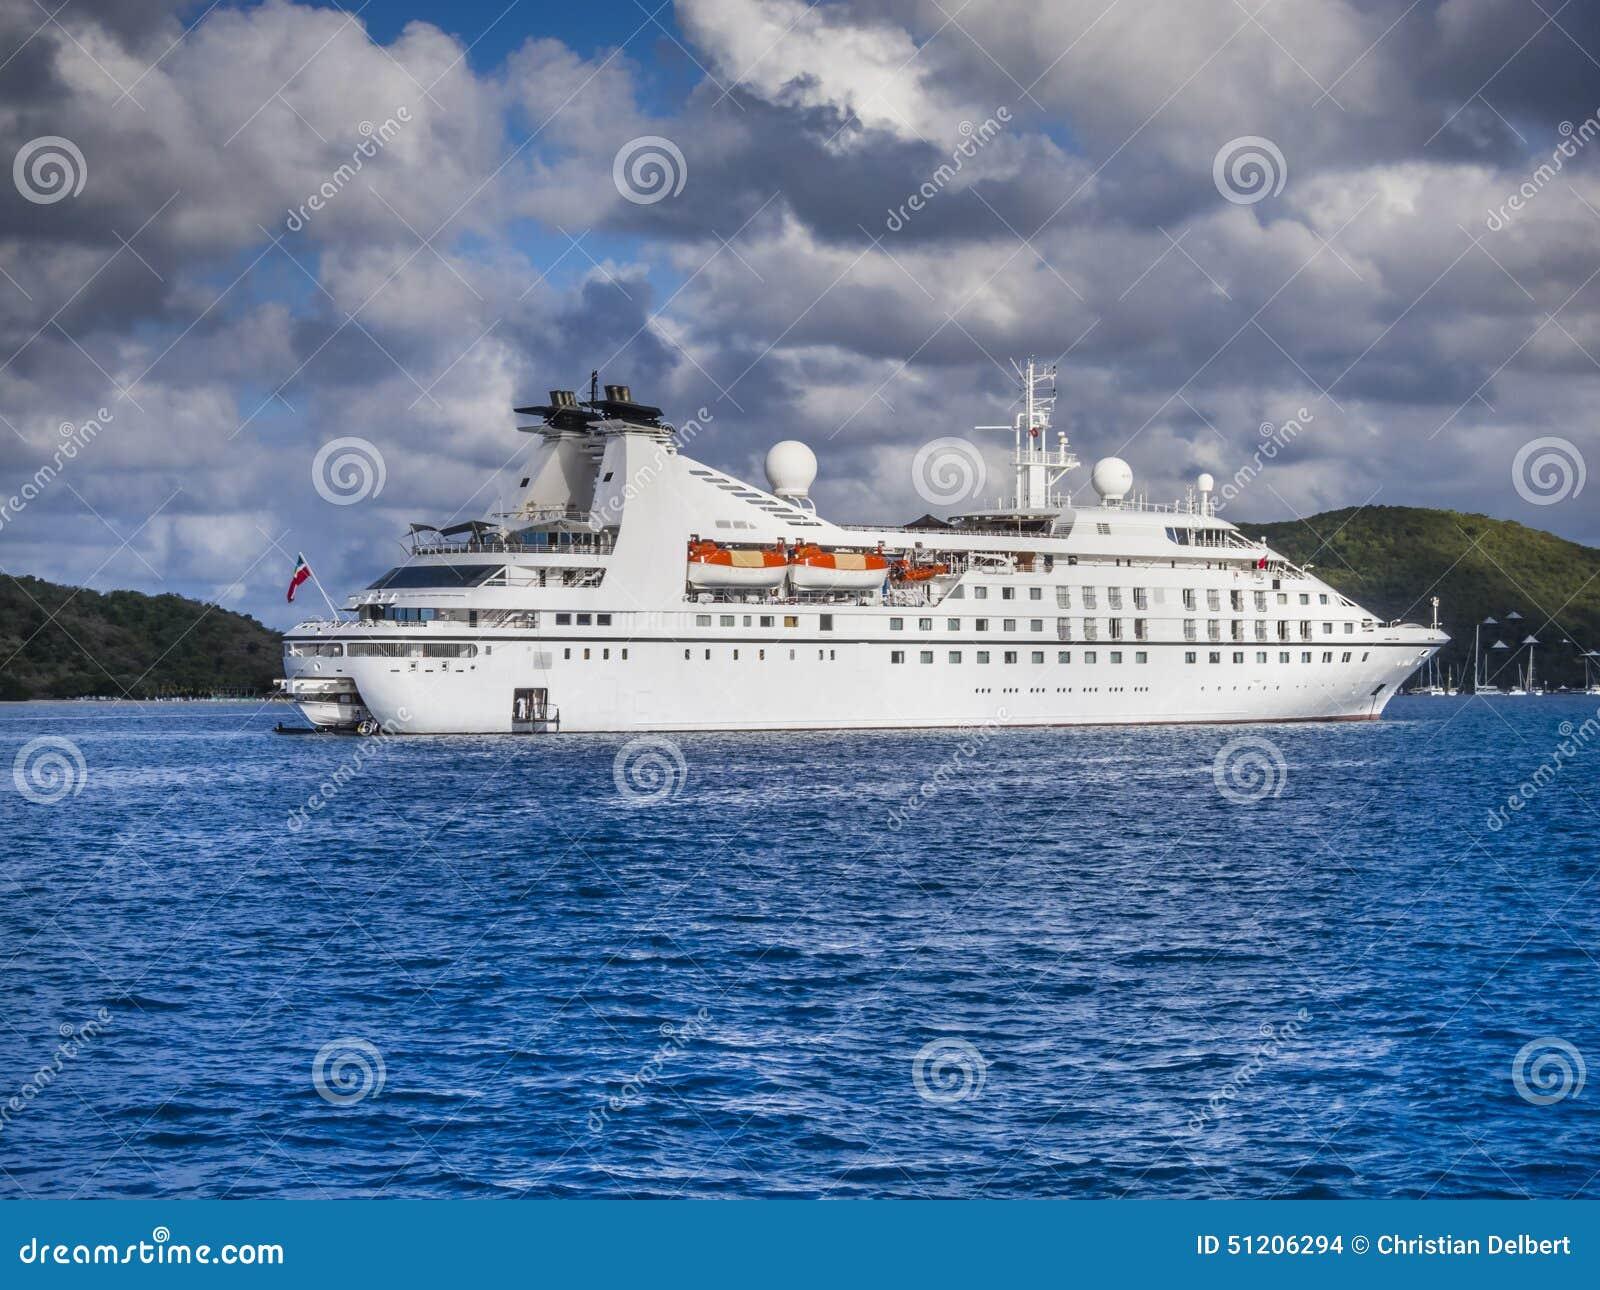 Small Cruise Ship Stock Photo - Image 51206294